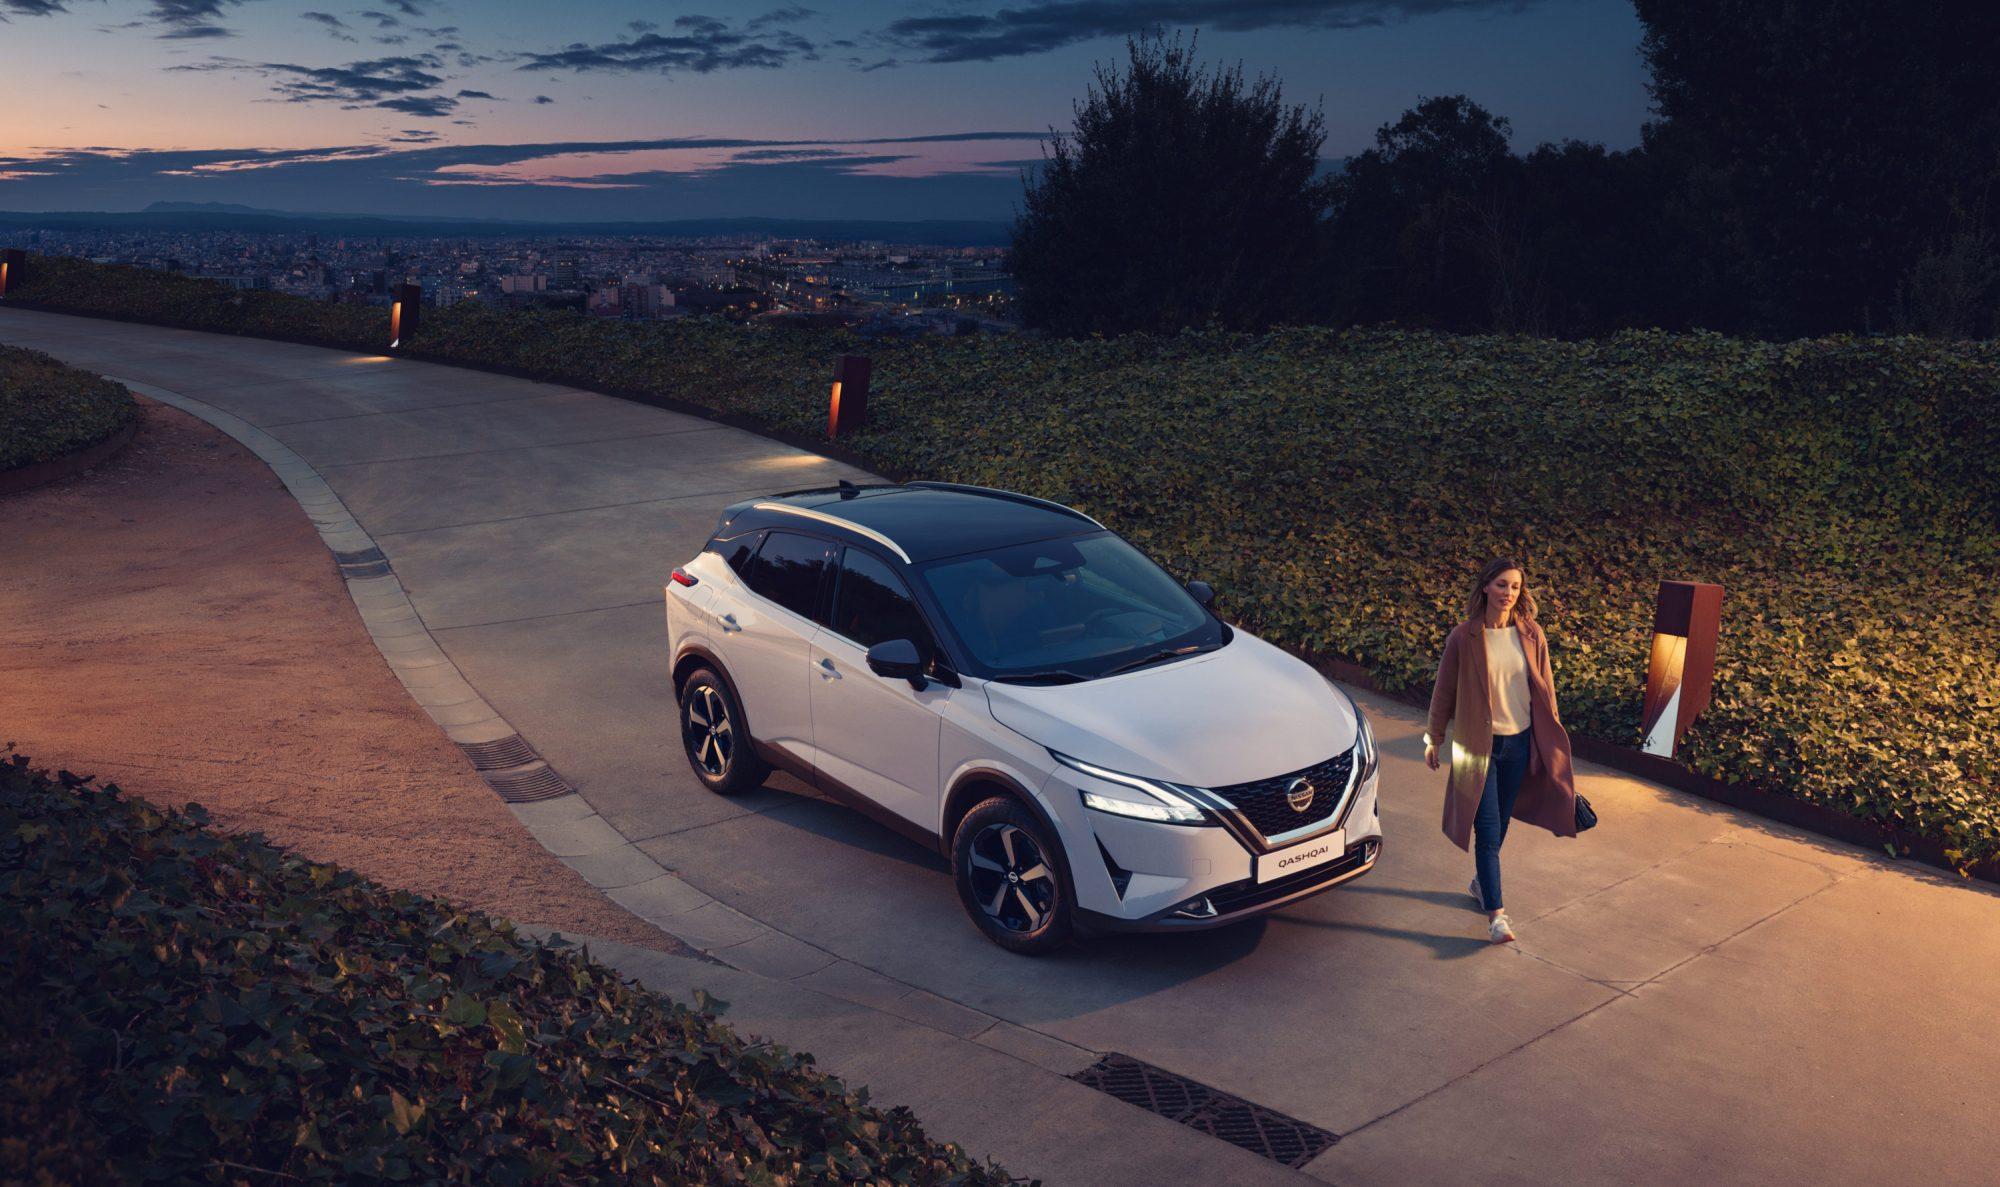 A concorrência que se prepare: Novo Nissan Qashqai chega a Portugal desde 29.000€